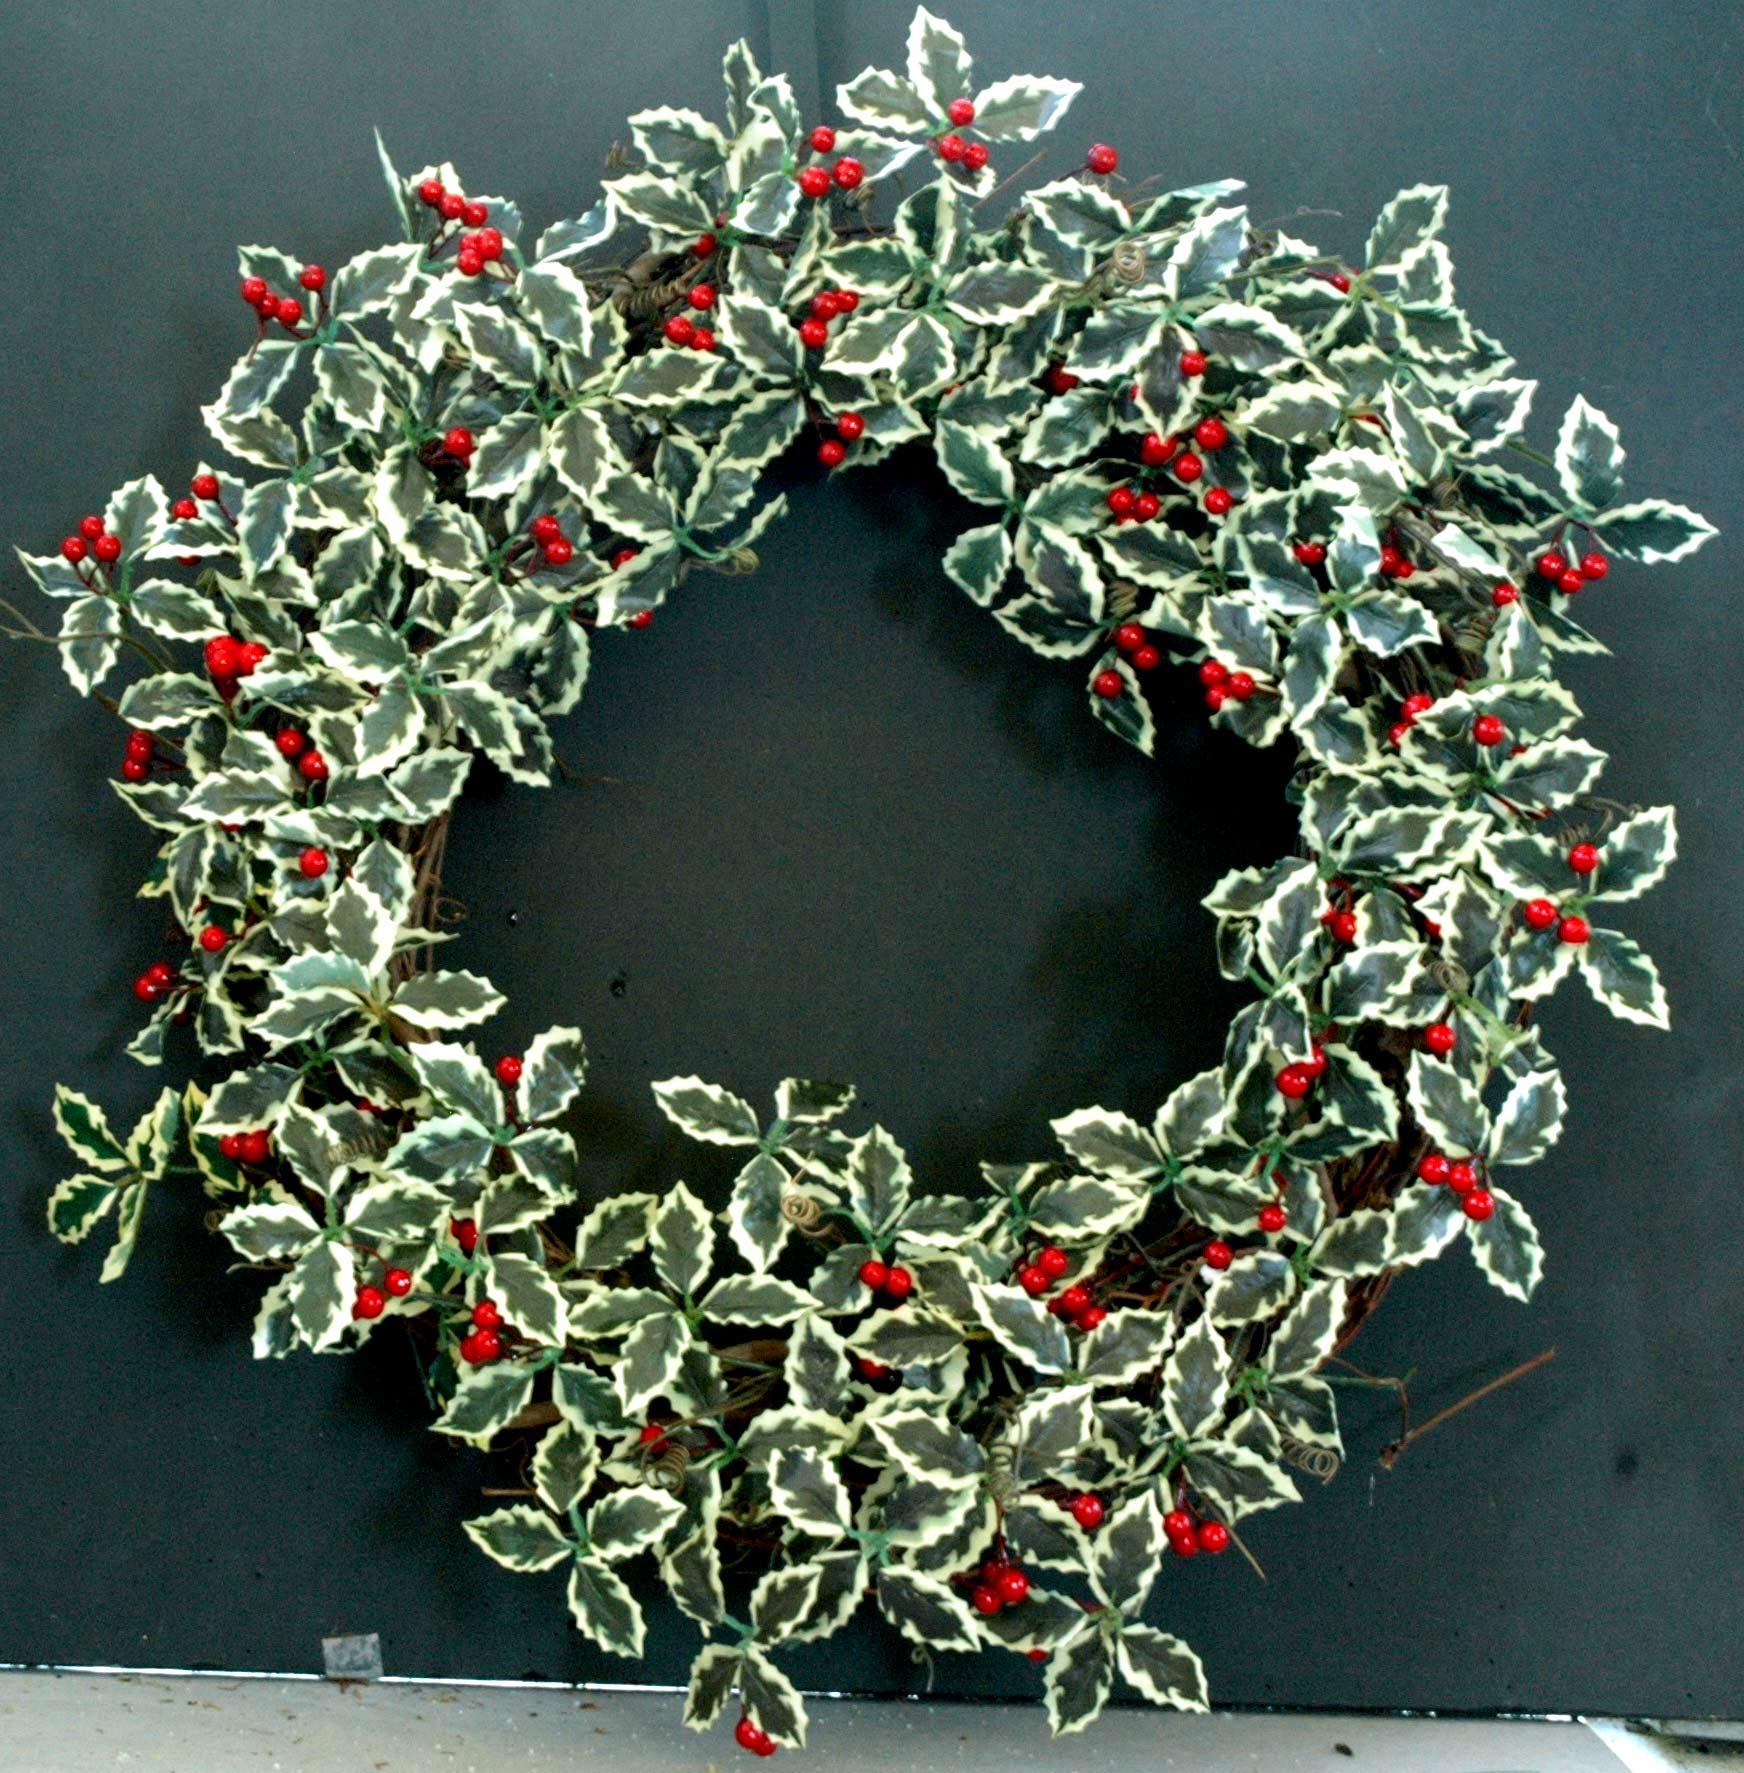 Addobbi natalizi per la casa le ghirlande - Addobbi di natale per finestre fai da te ...